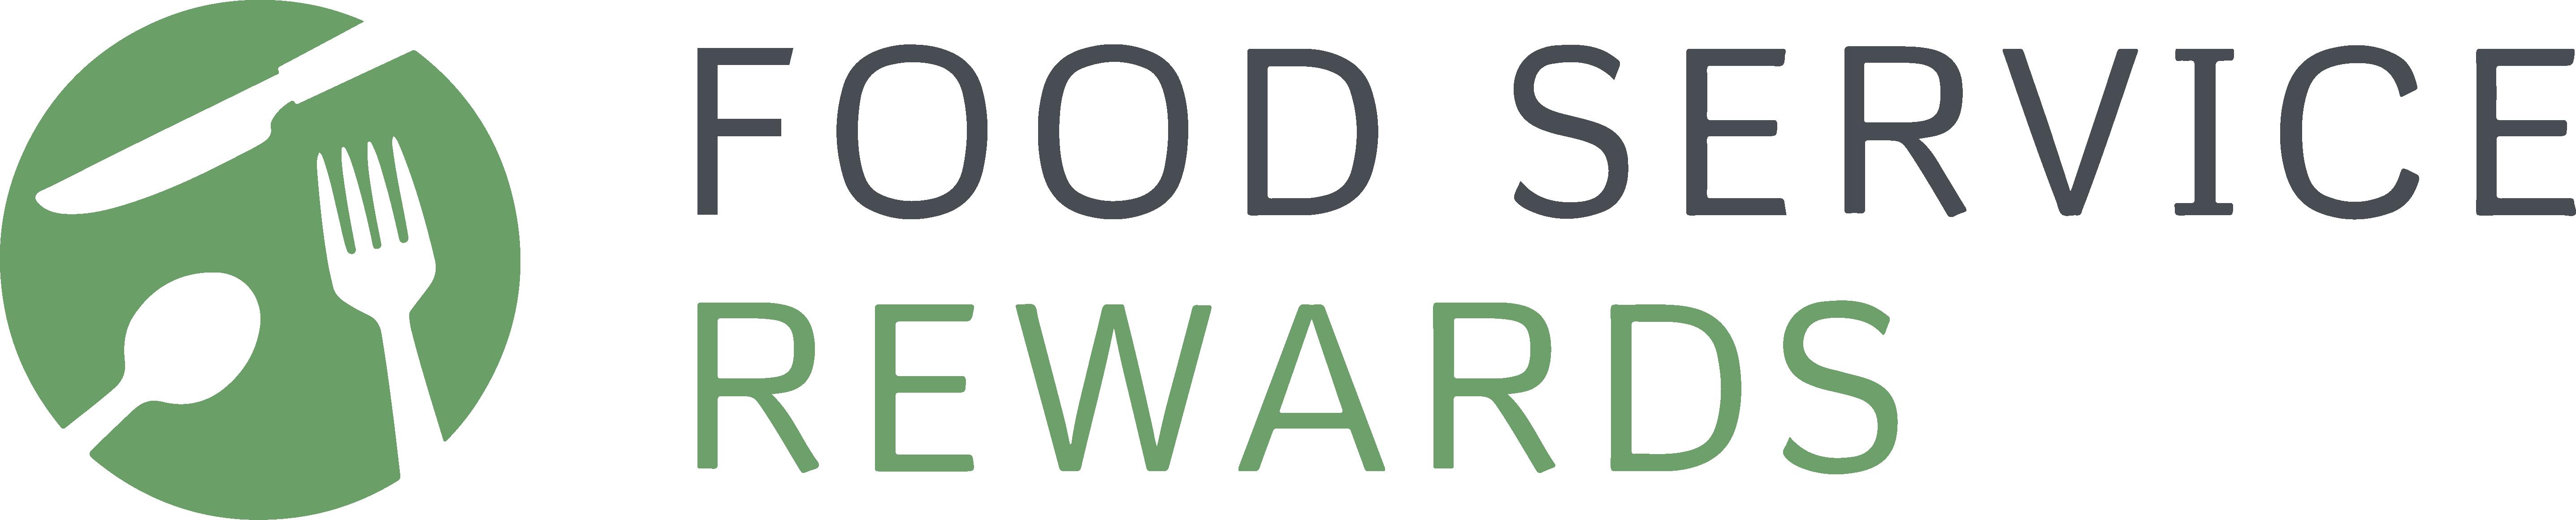 Food Service Rewards Logo